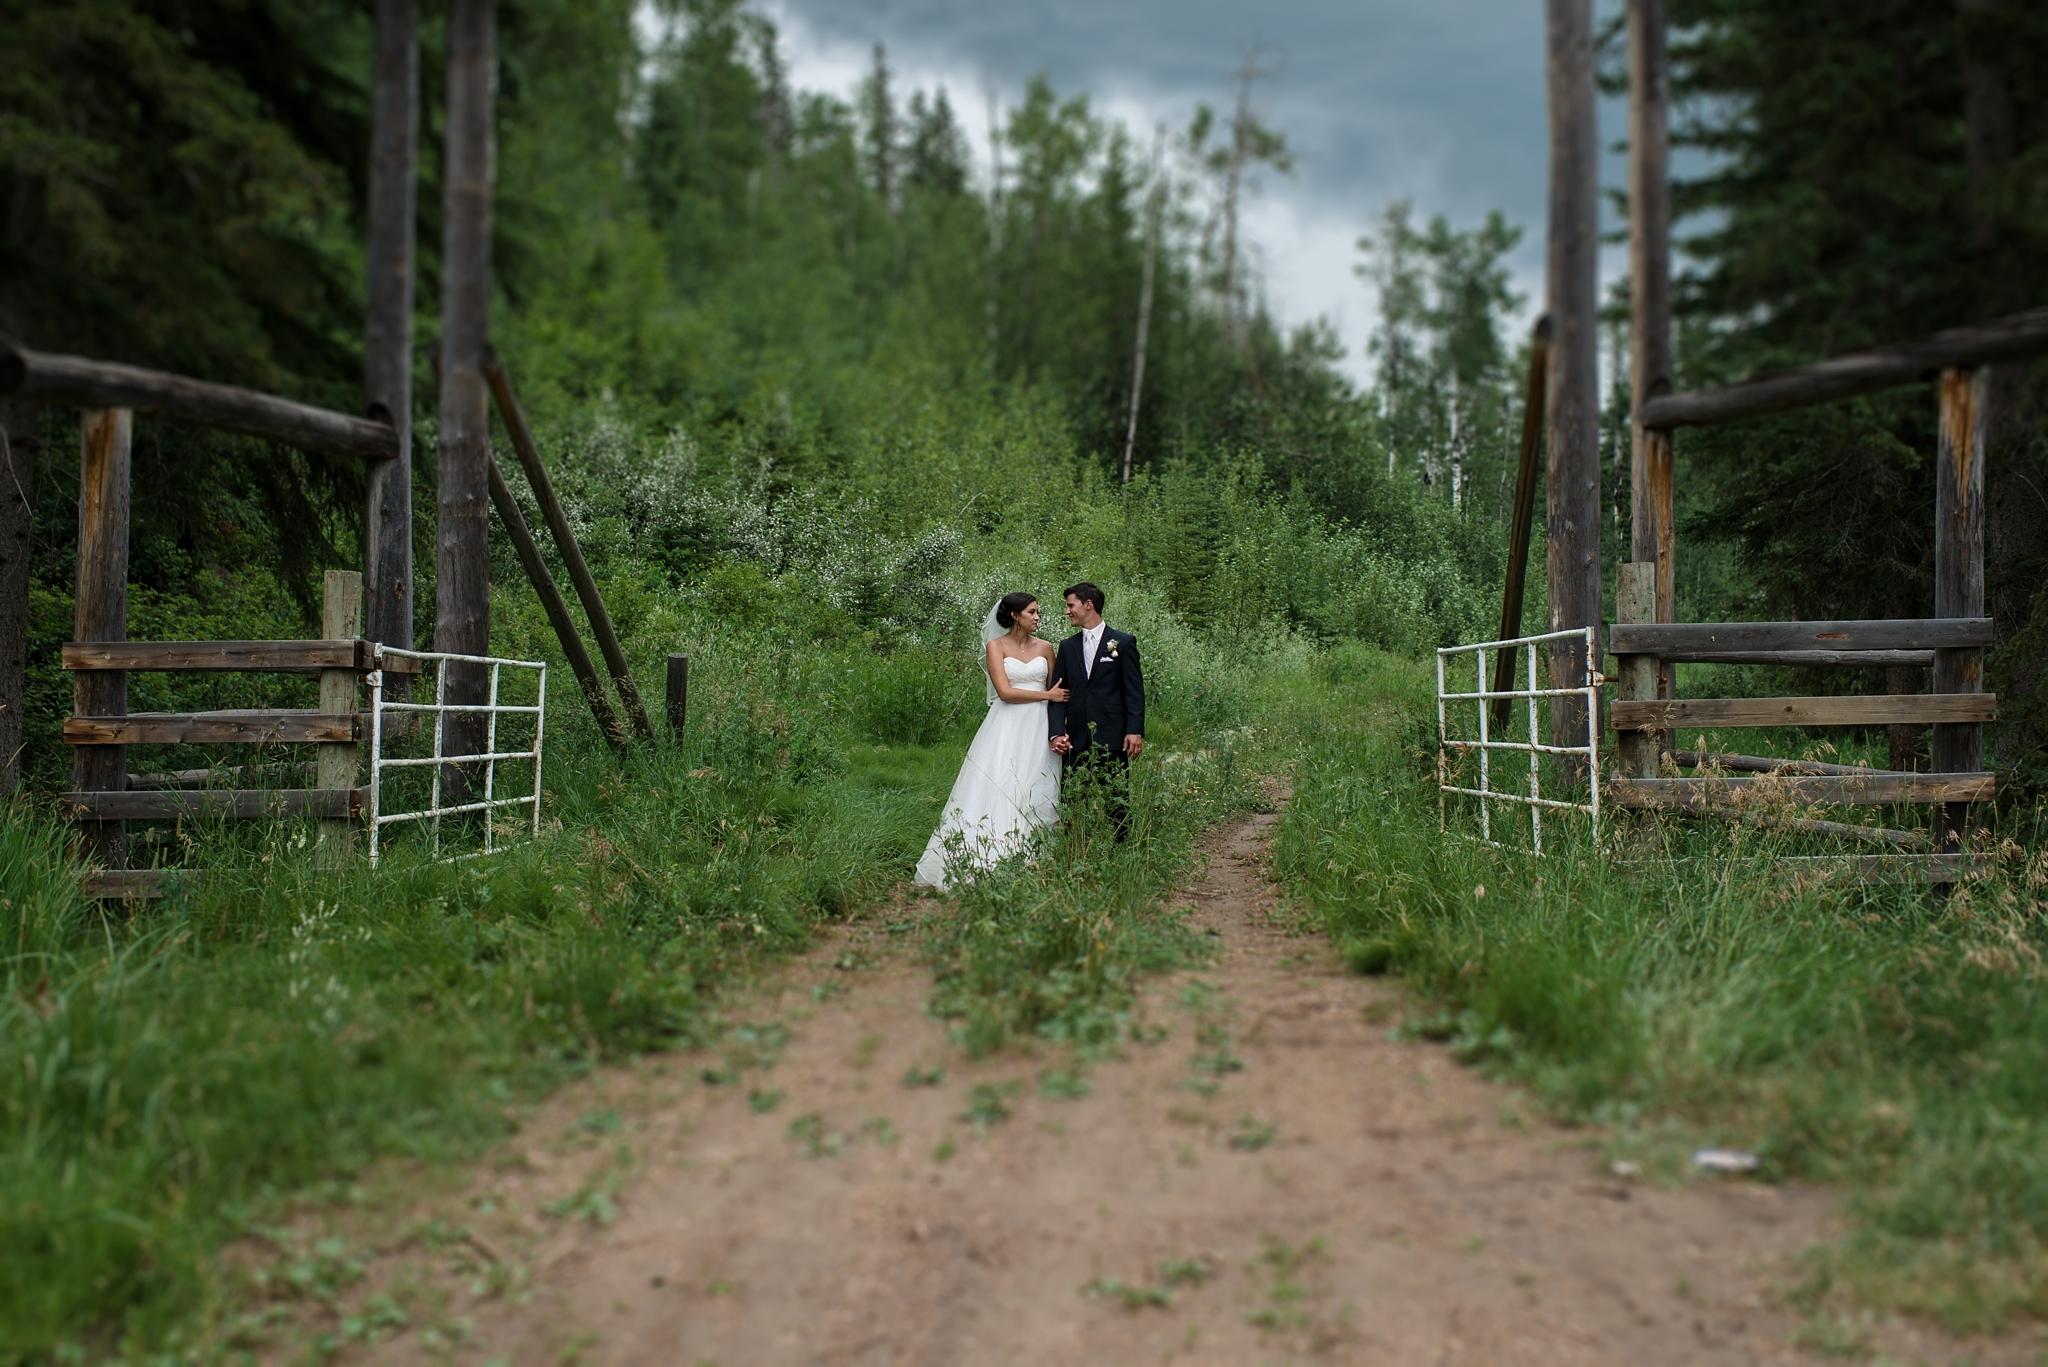 kaihla_tonai_intimate_wedding_elopement_photographer_0099